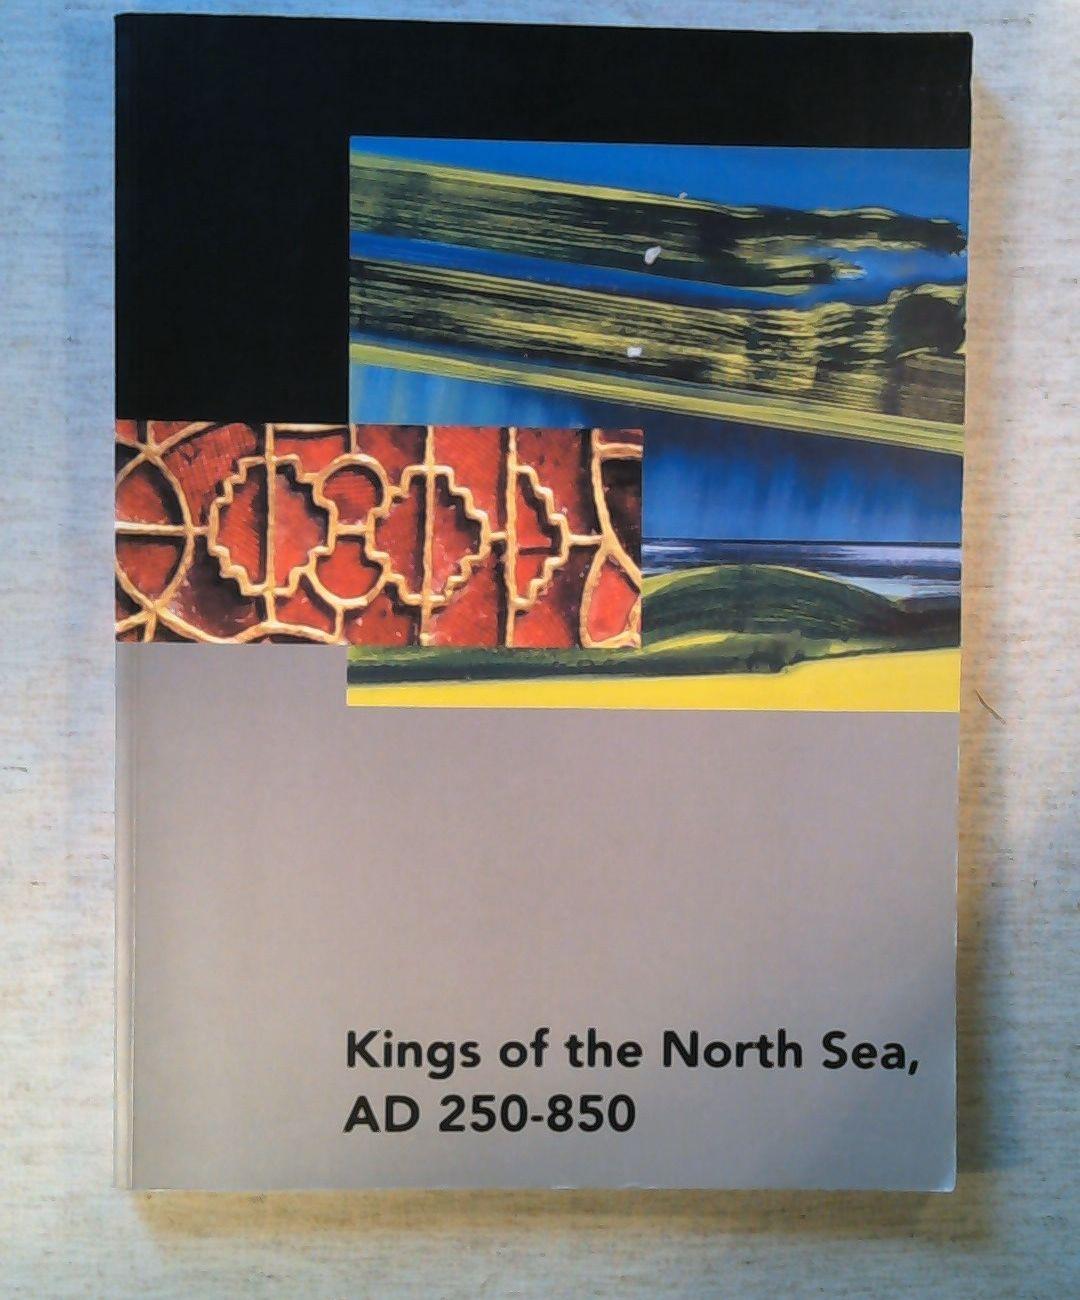 Kings of the North Sea, AD 250-280: Kramer, E.: